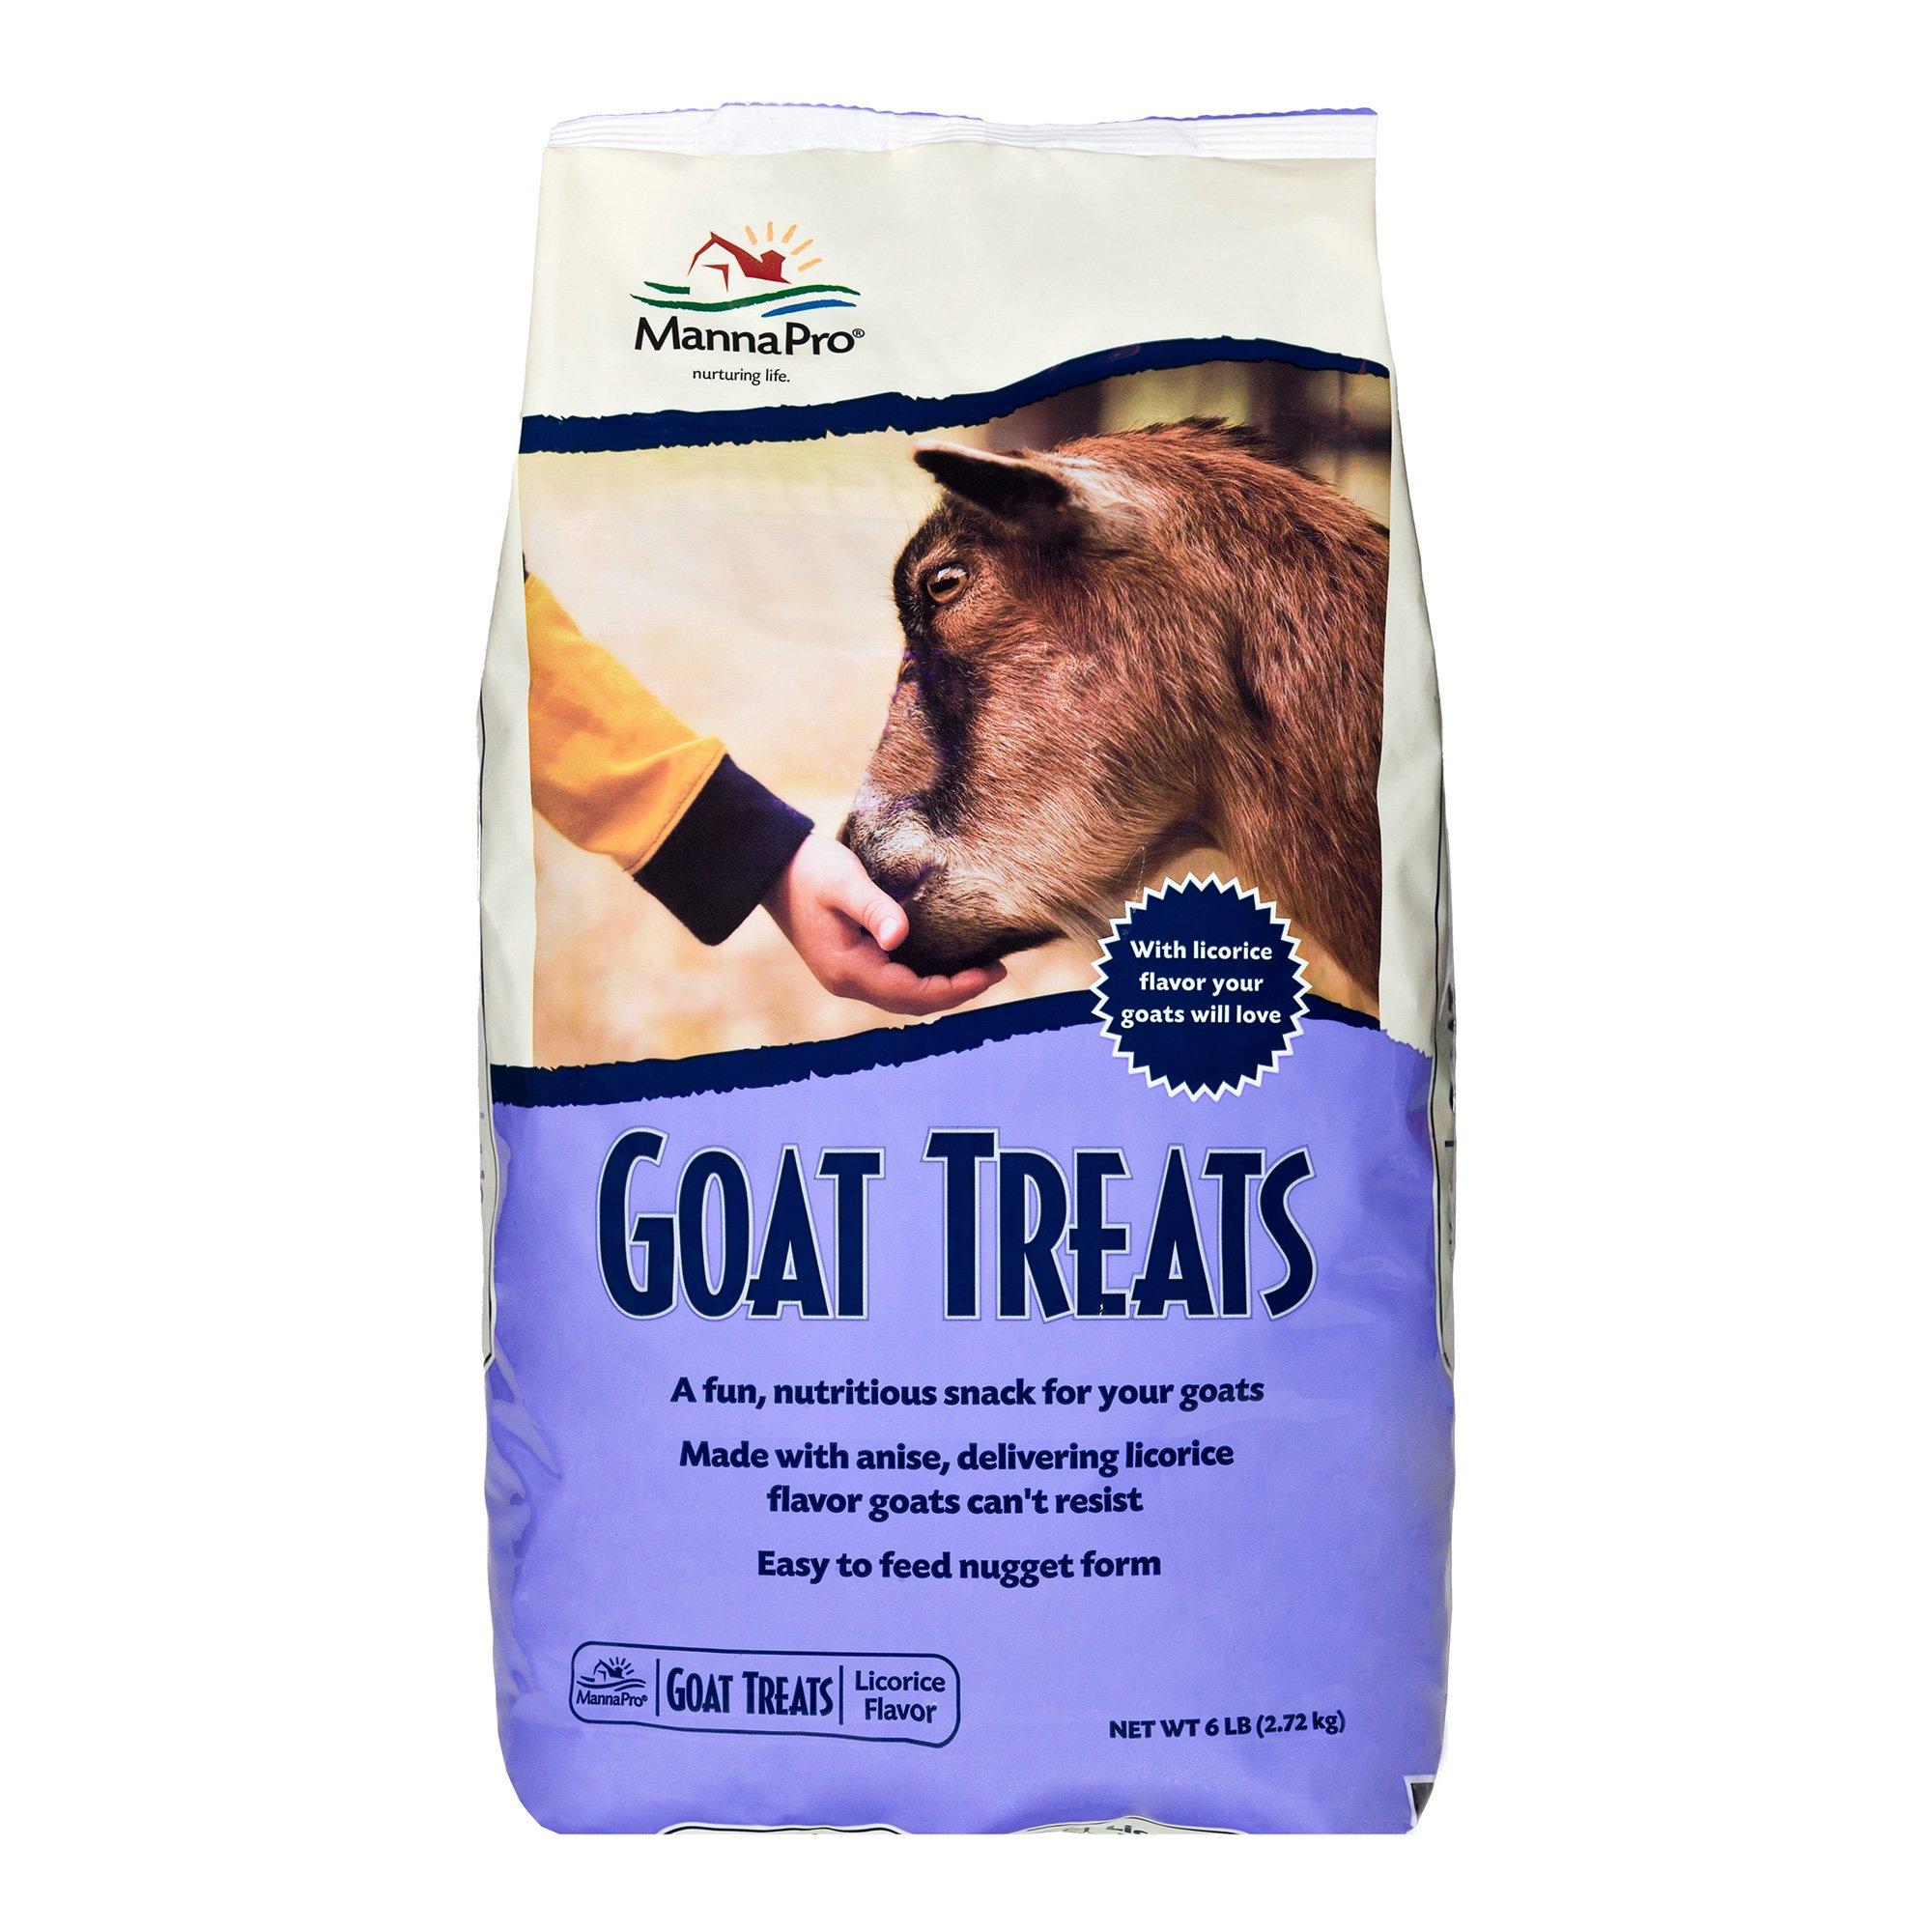 Manna Pro Licorice Goat Treats, 6 lb by Manna Pro (Image #1)